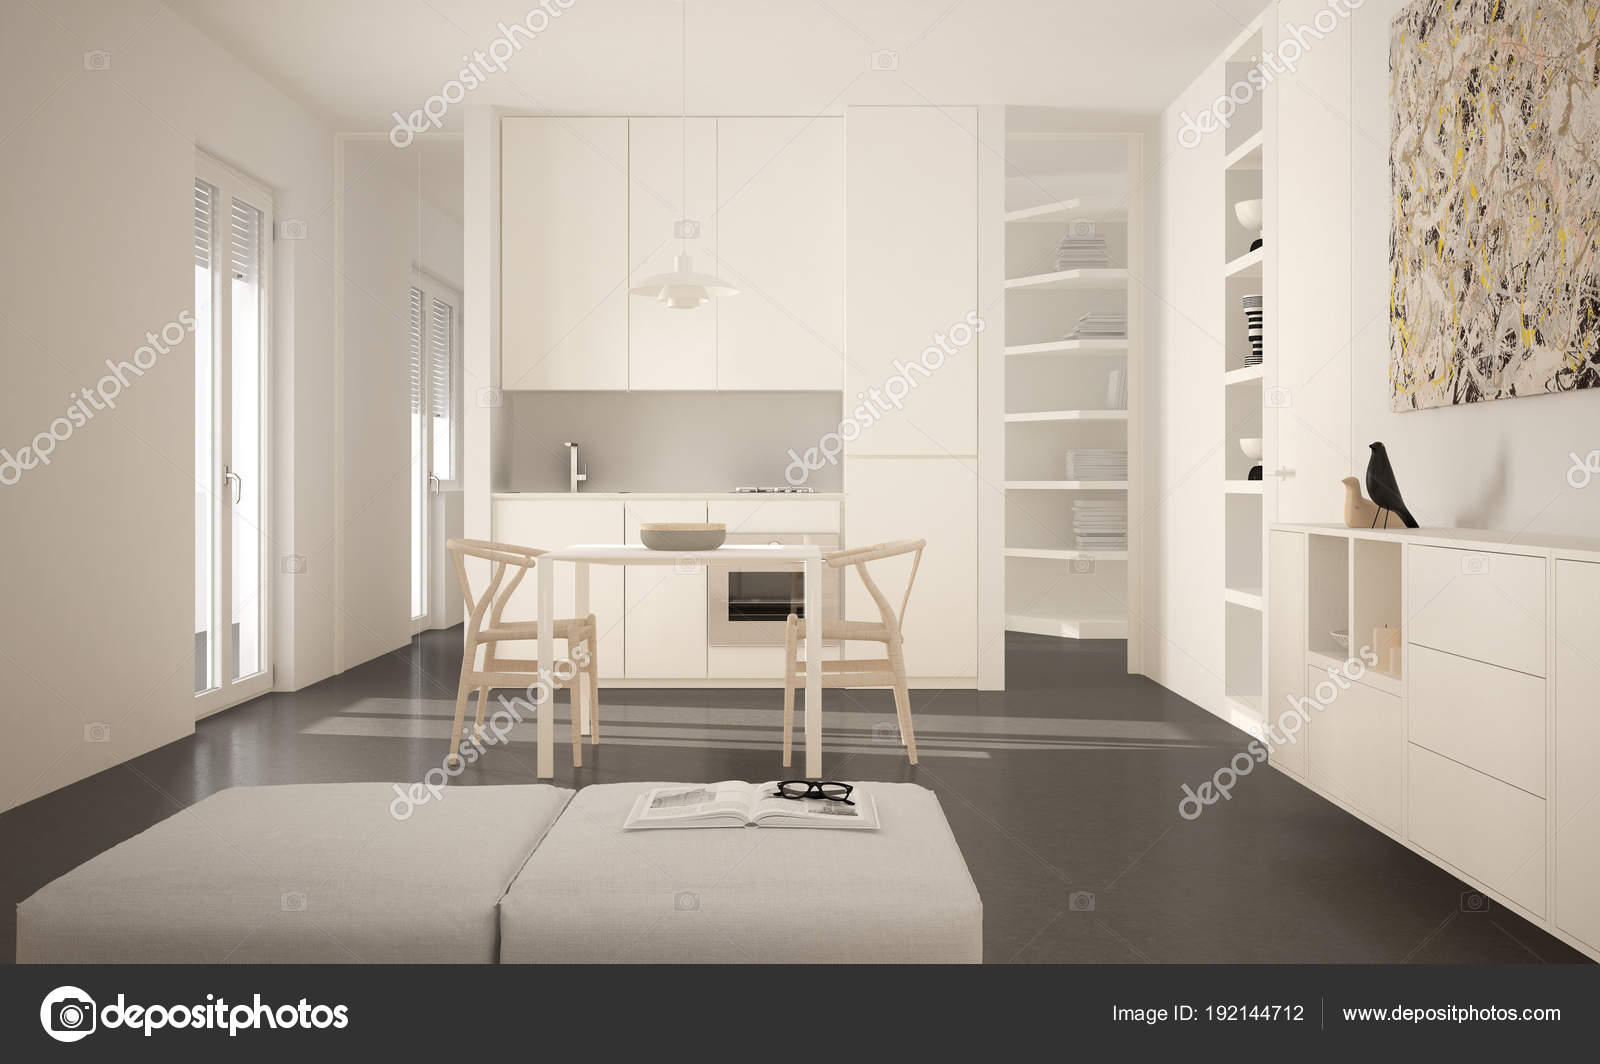 Ikea keuken bar minimalistische nlfunvit eetkamertafels en stoelen